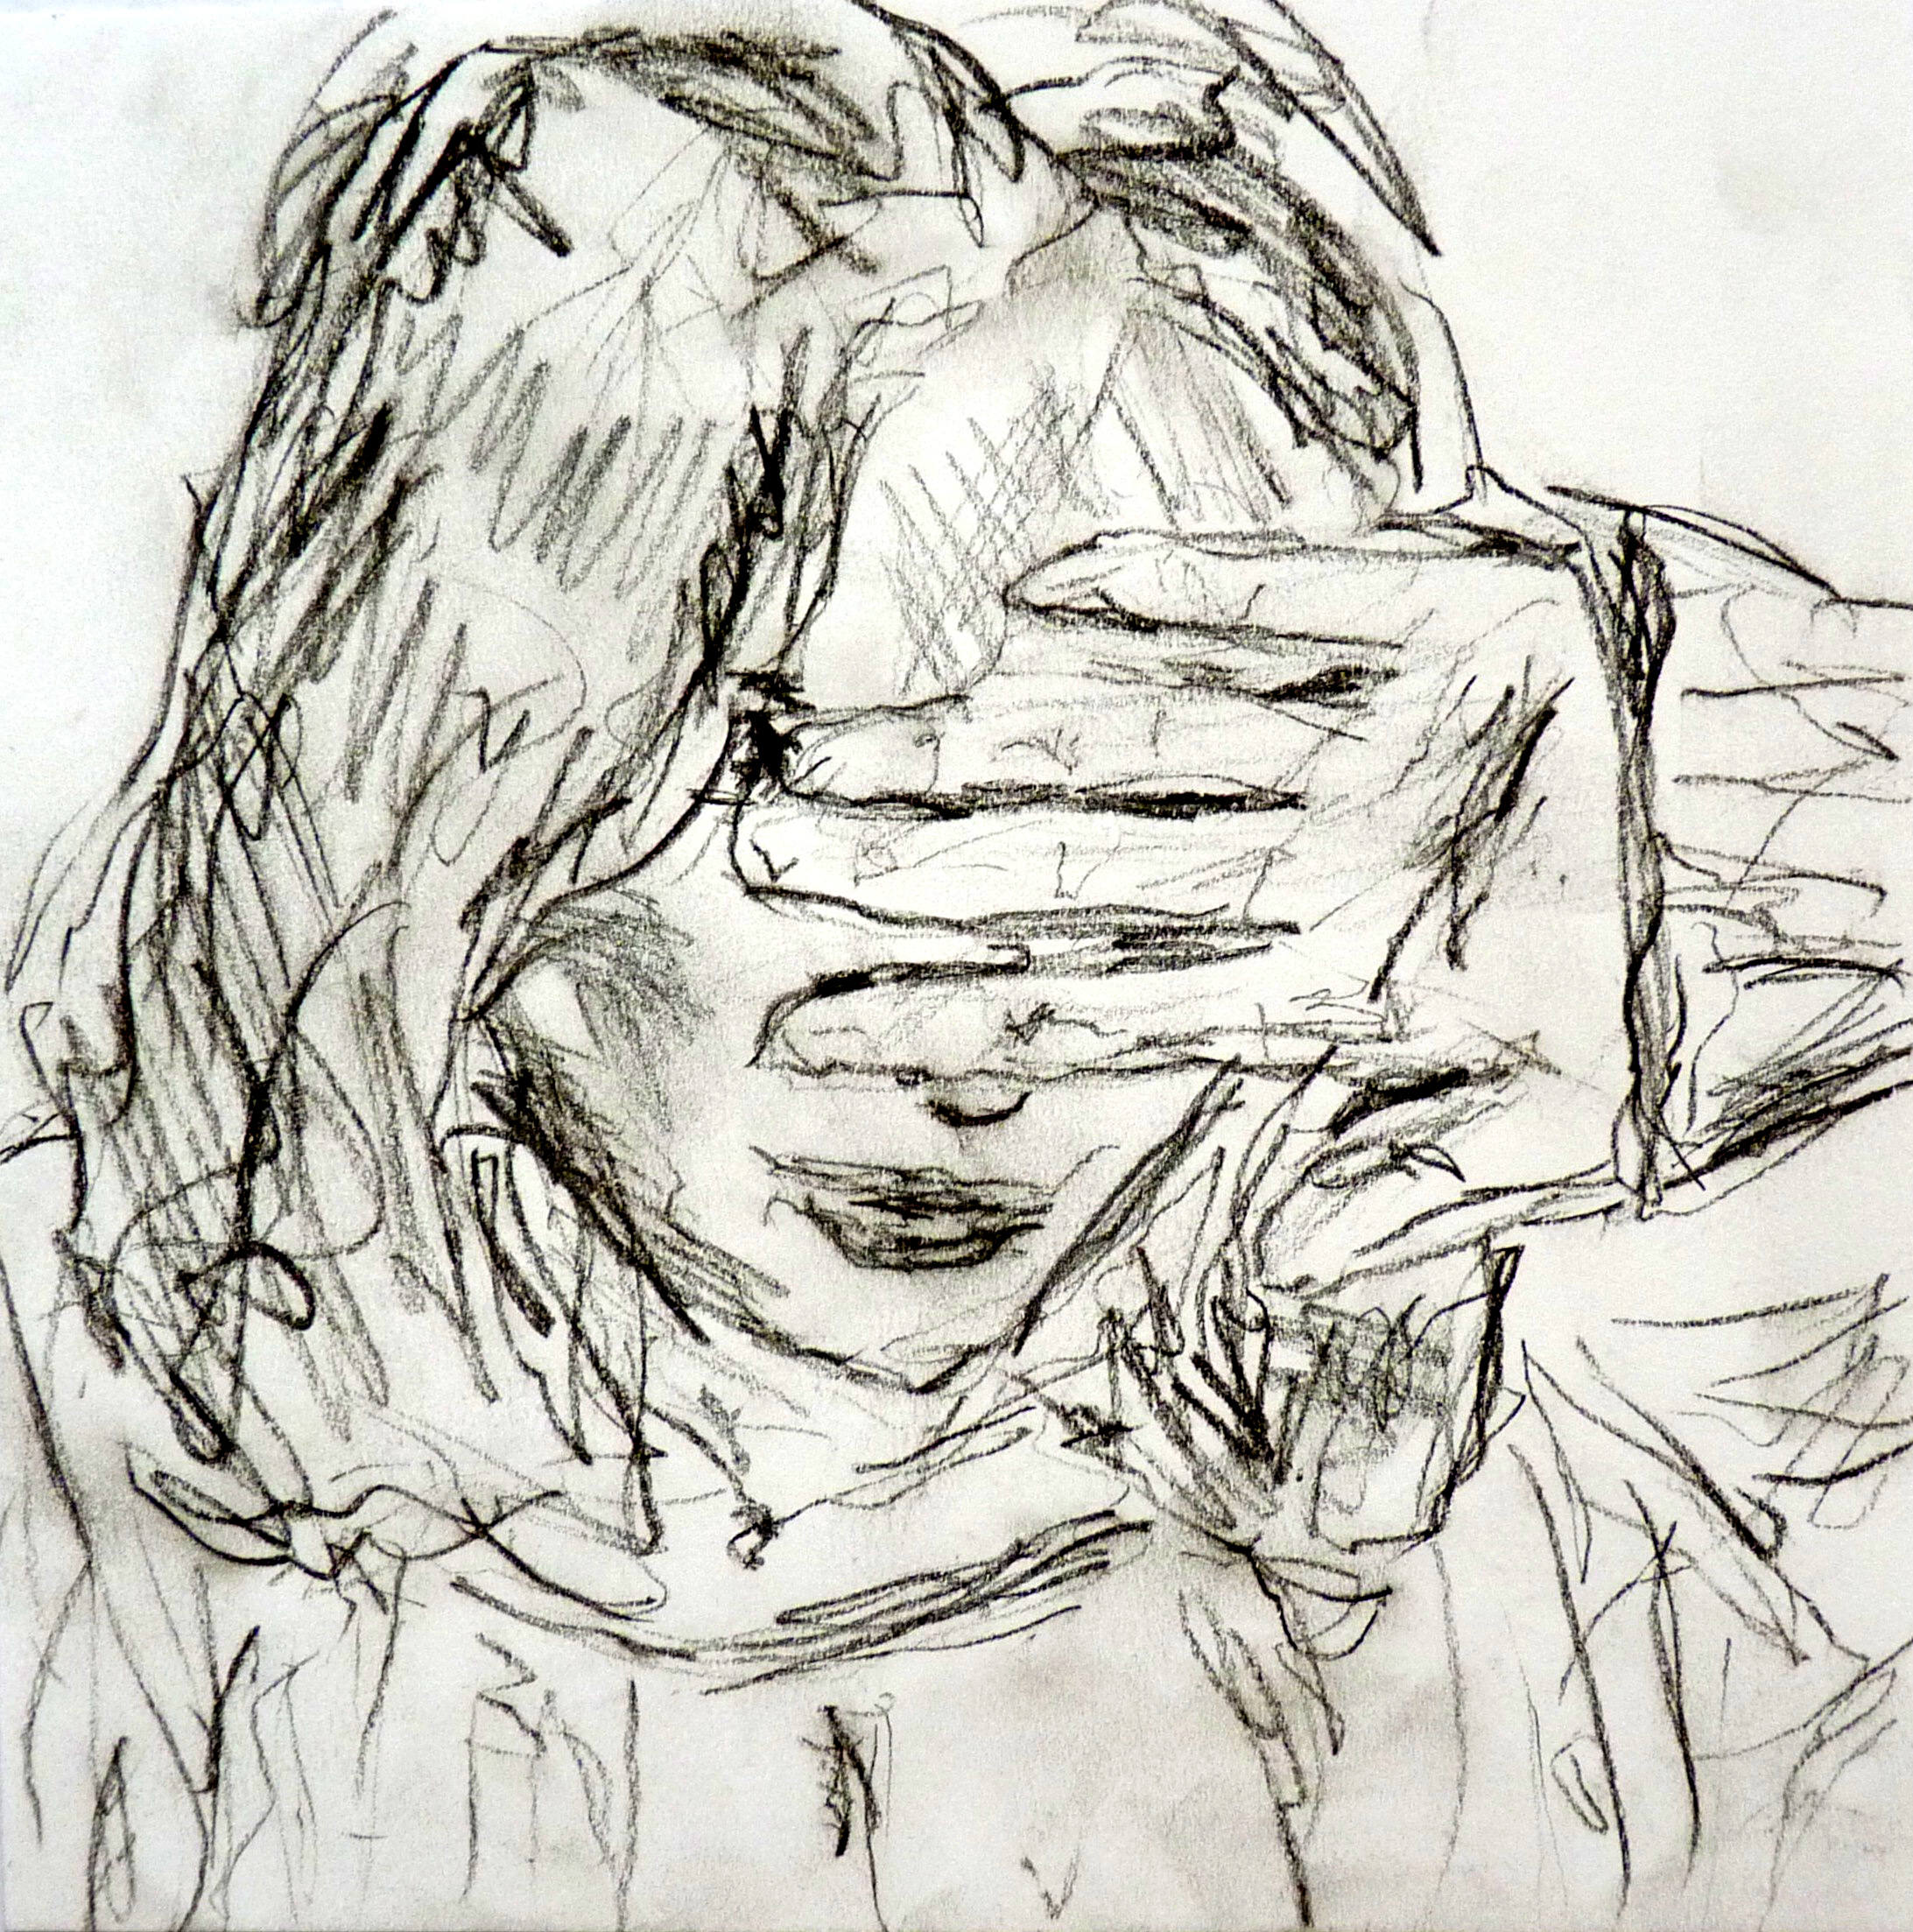 sketch, graphite on paper, 15 x 15 cm